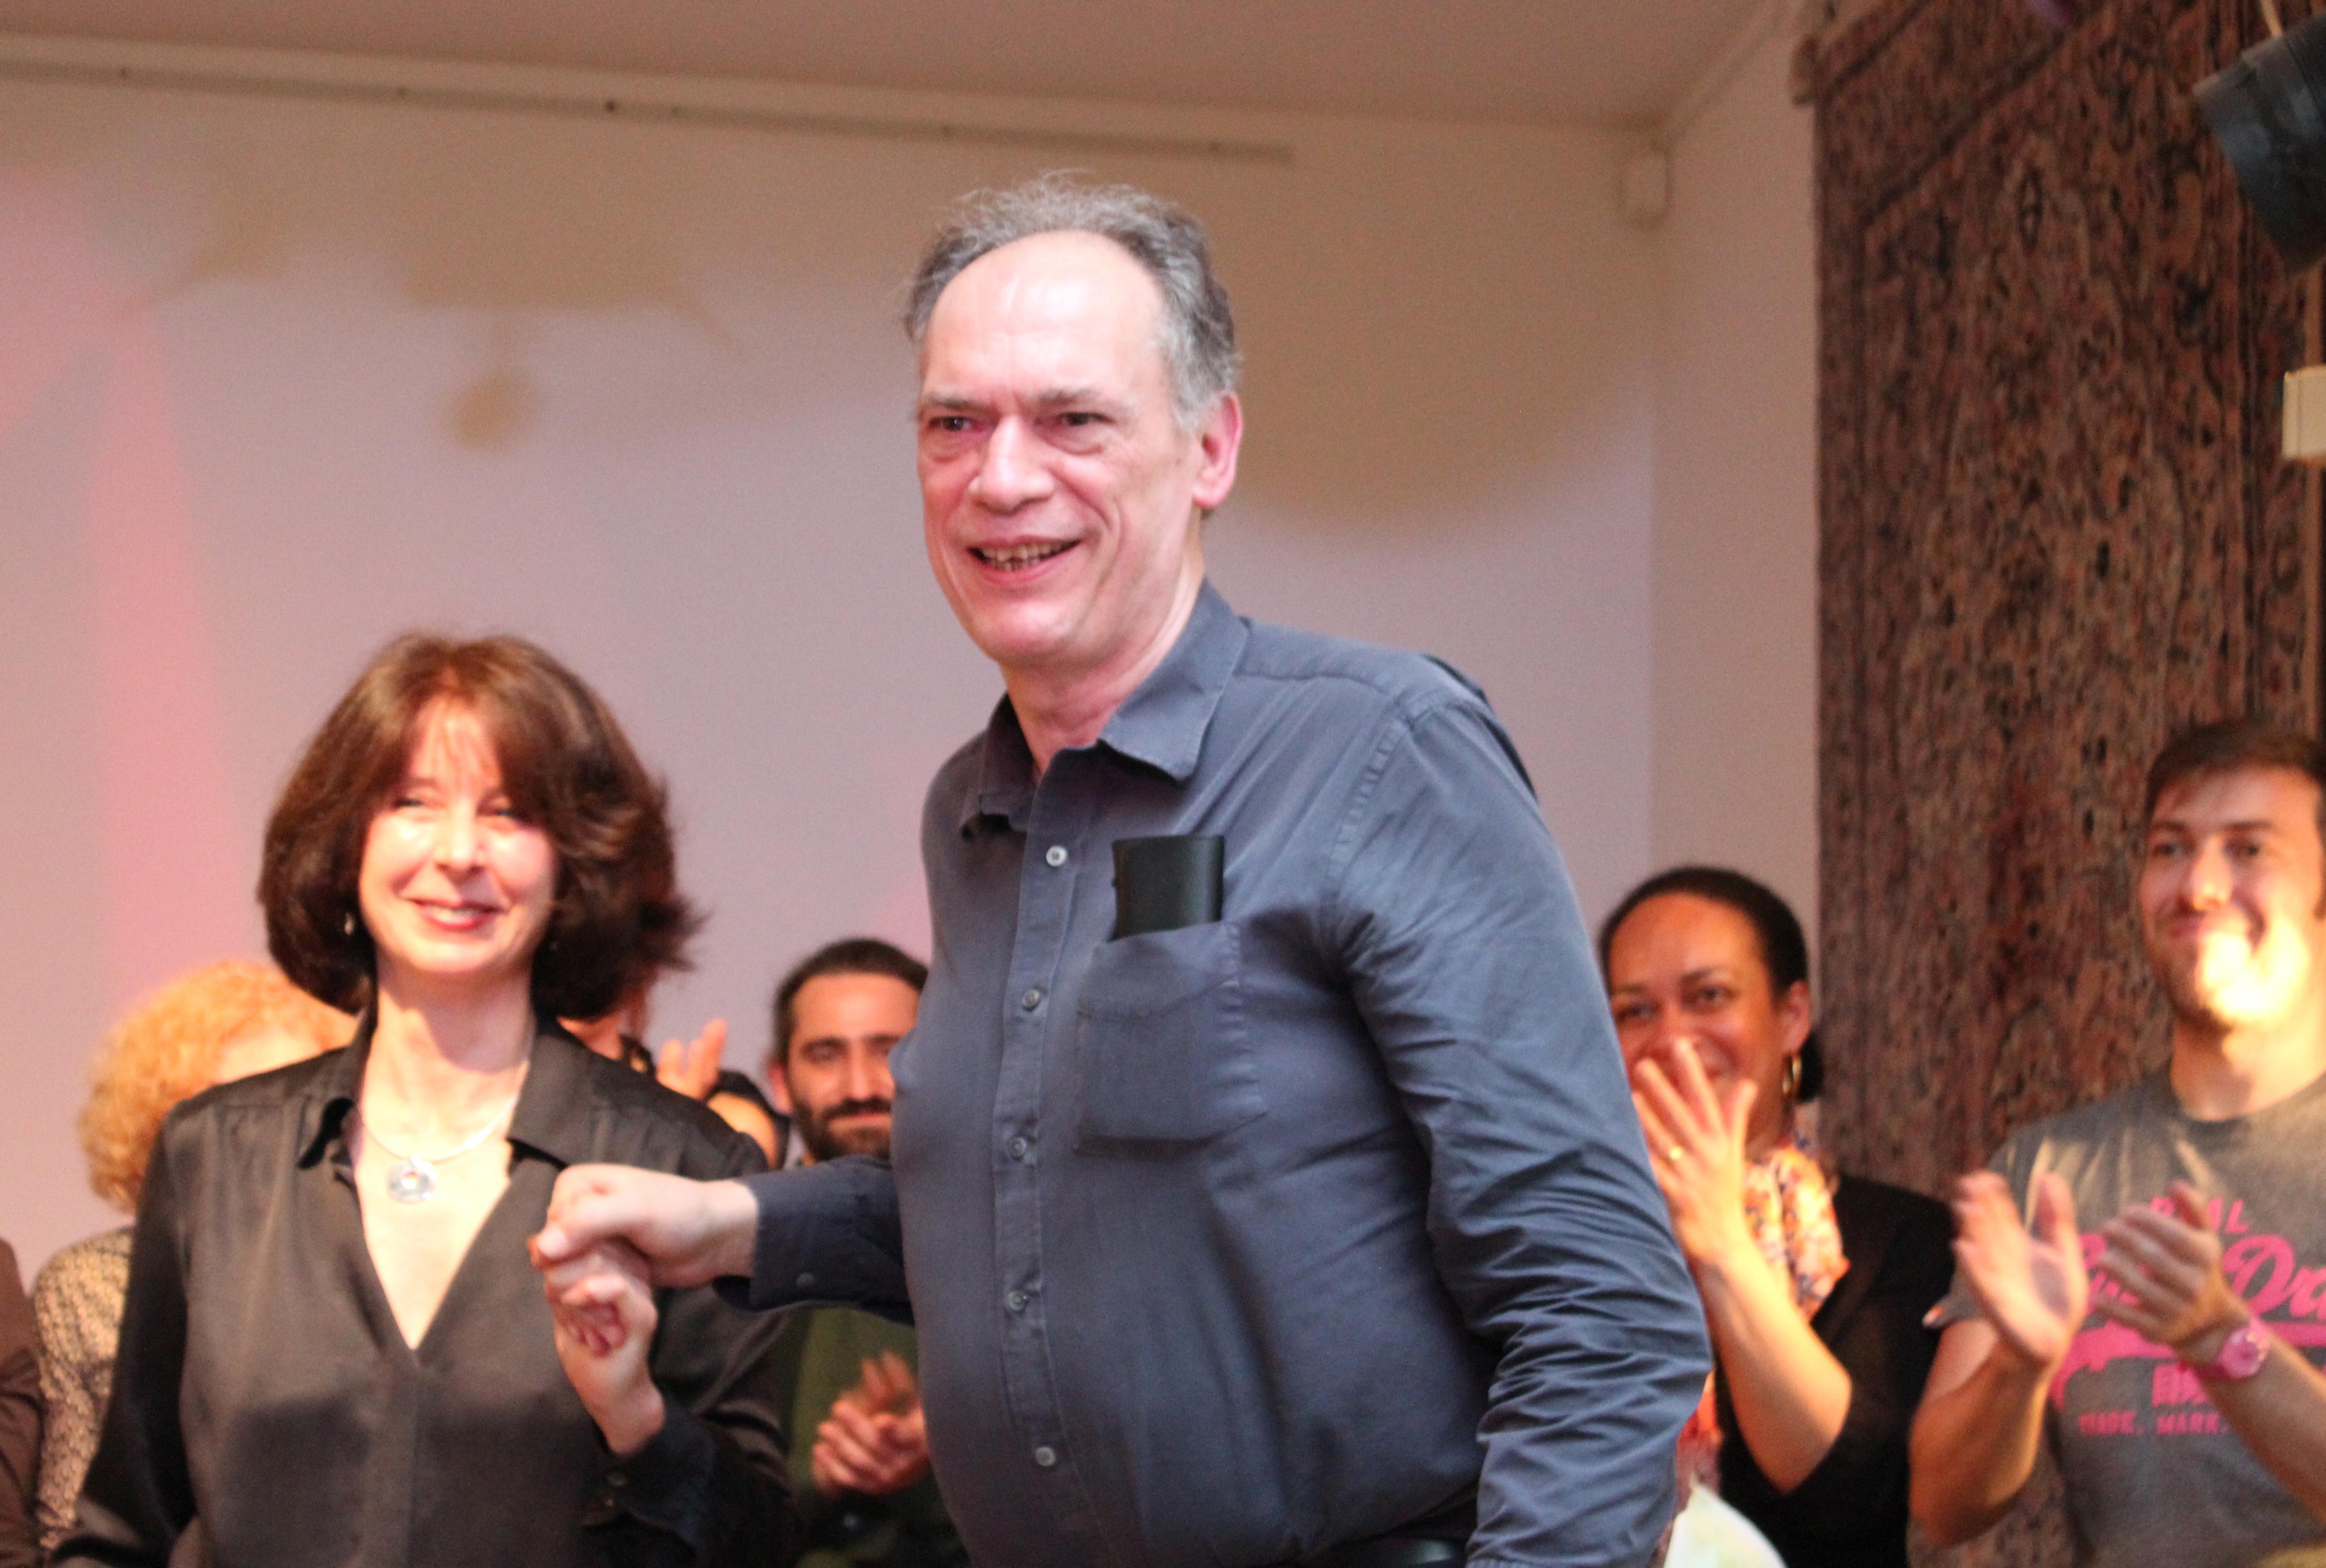 Michele Troise with pianist David Triestram